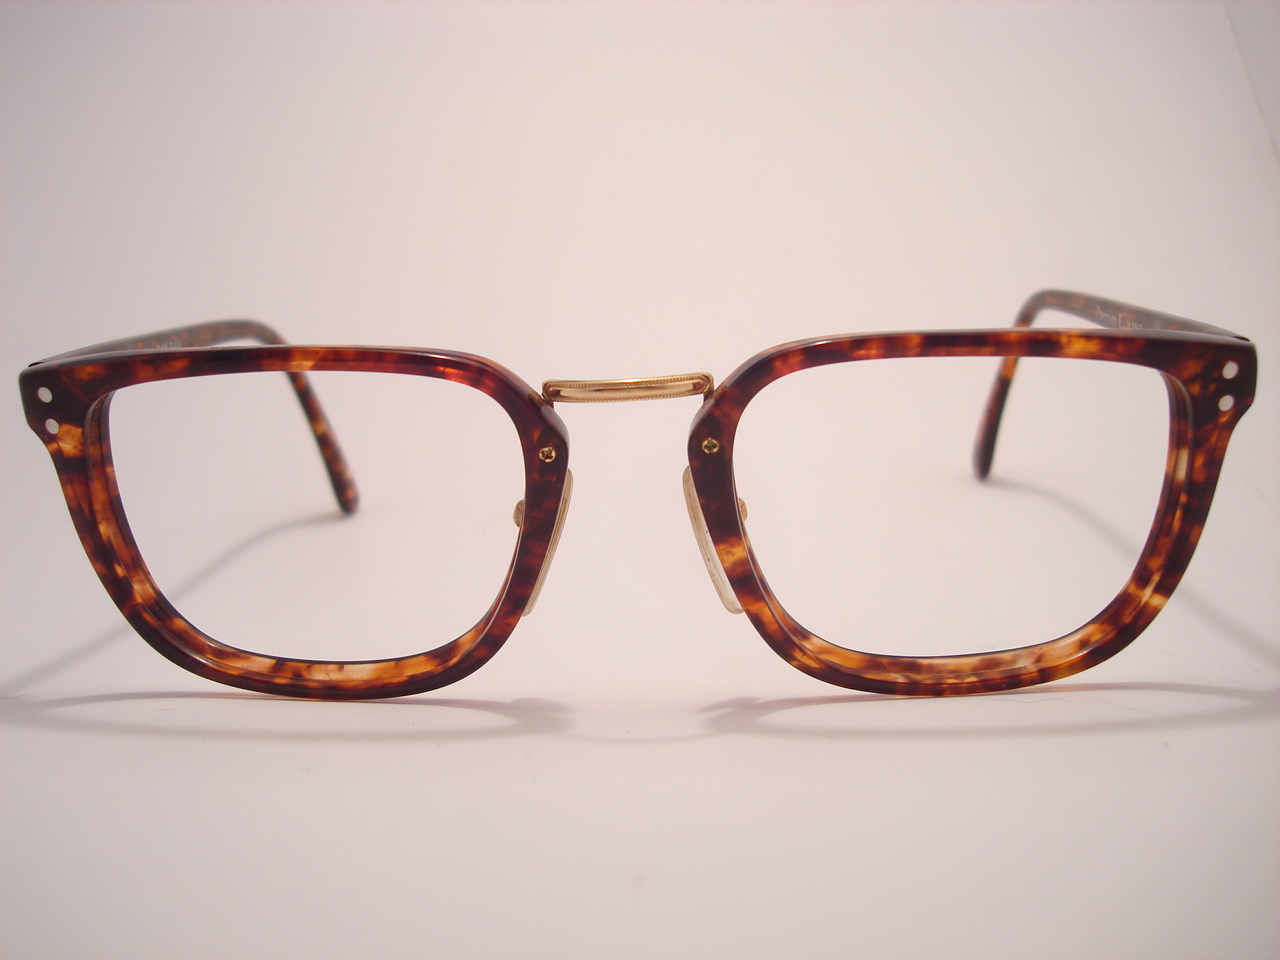 Ray Ban Vintage Eyeglasses